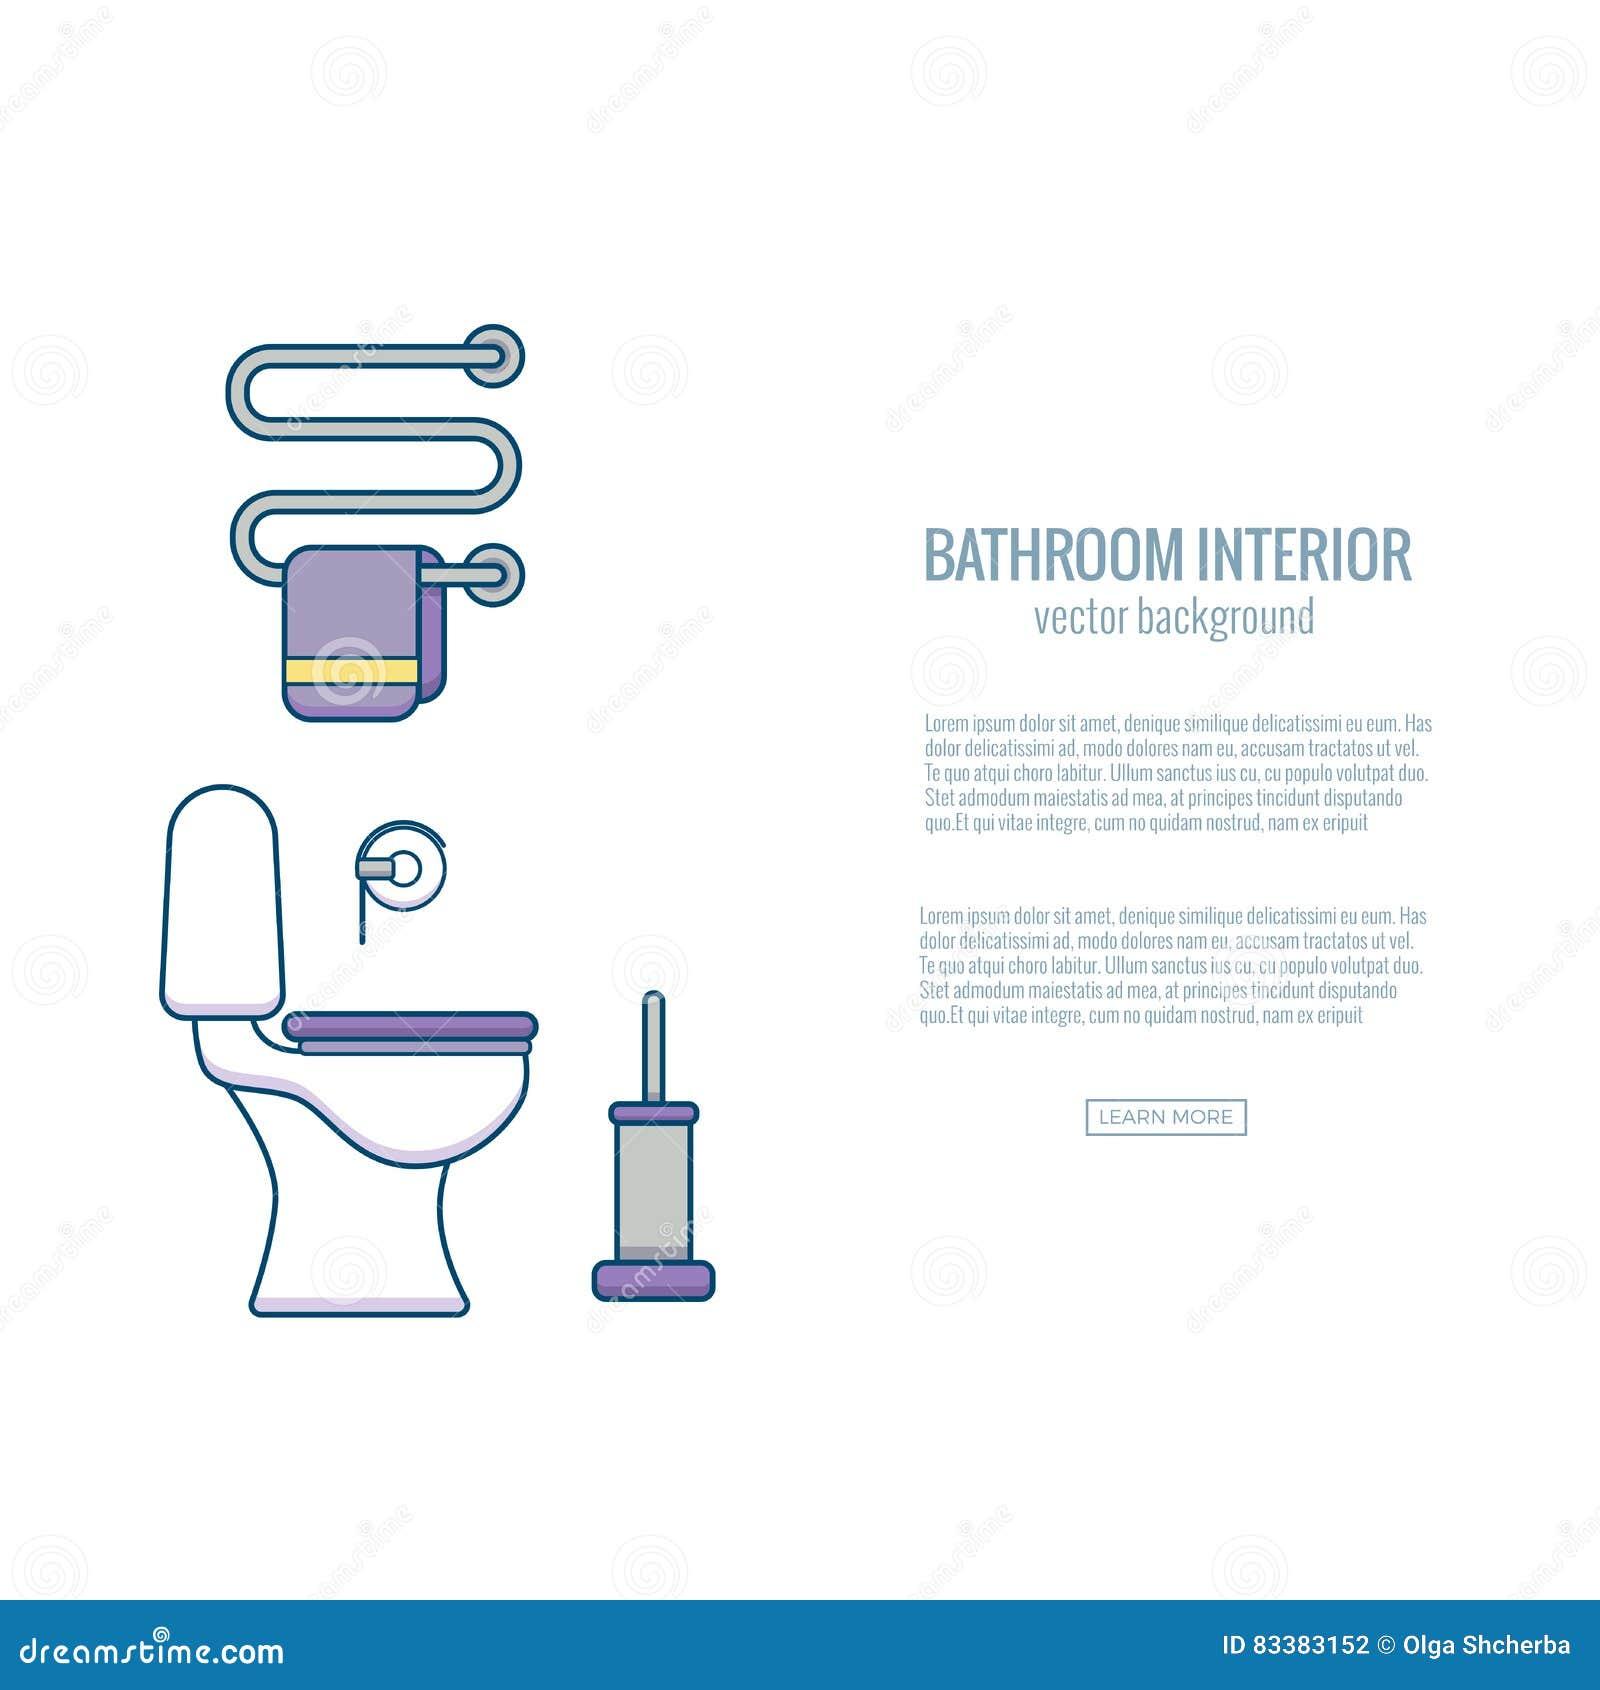 BATHROOM-END